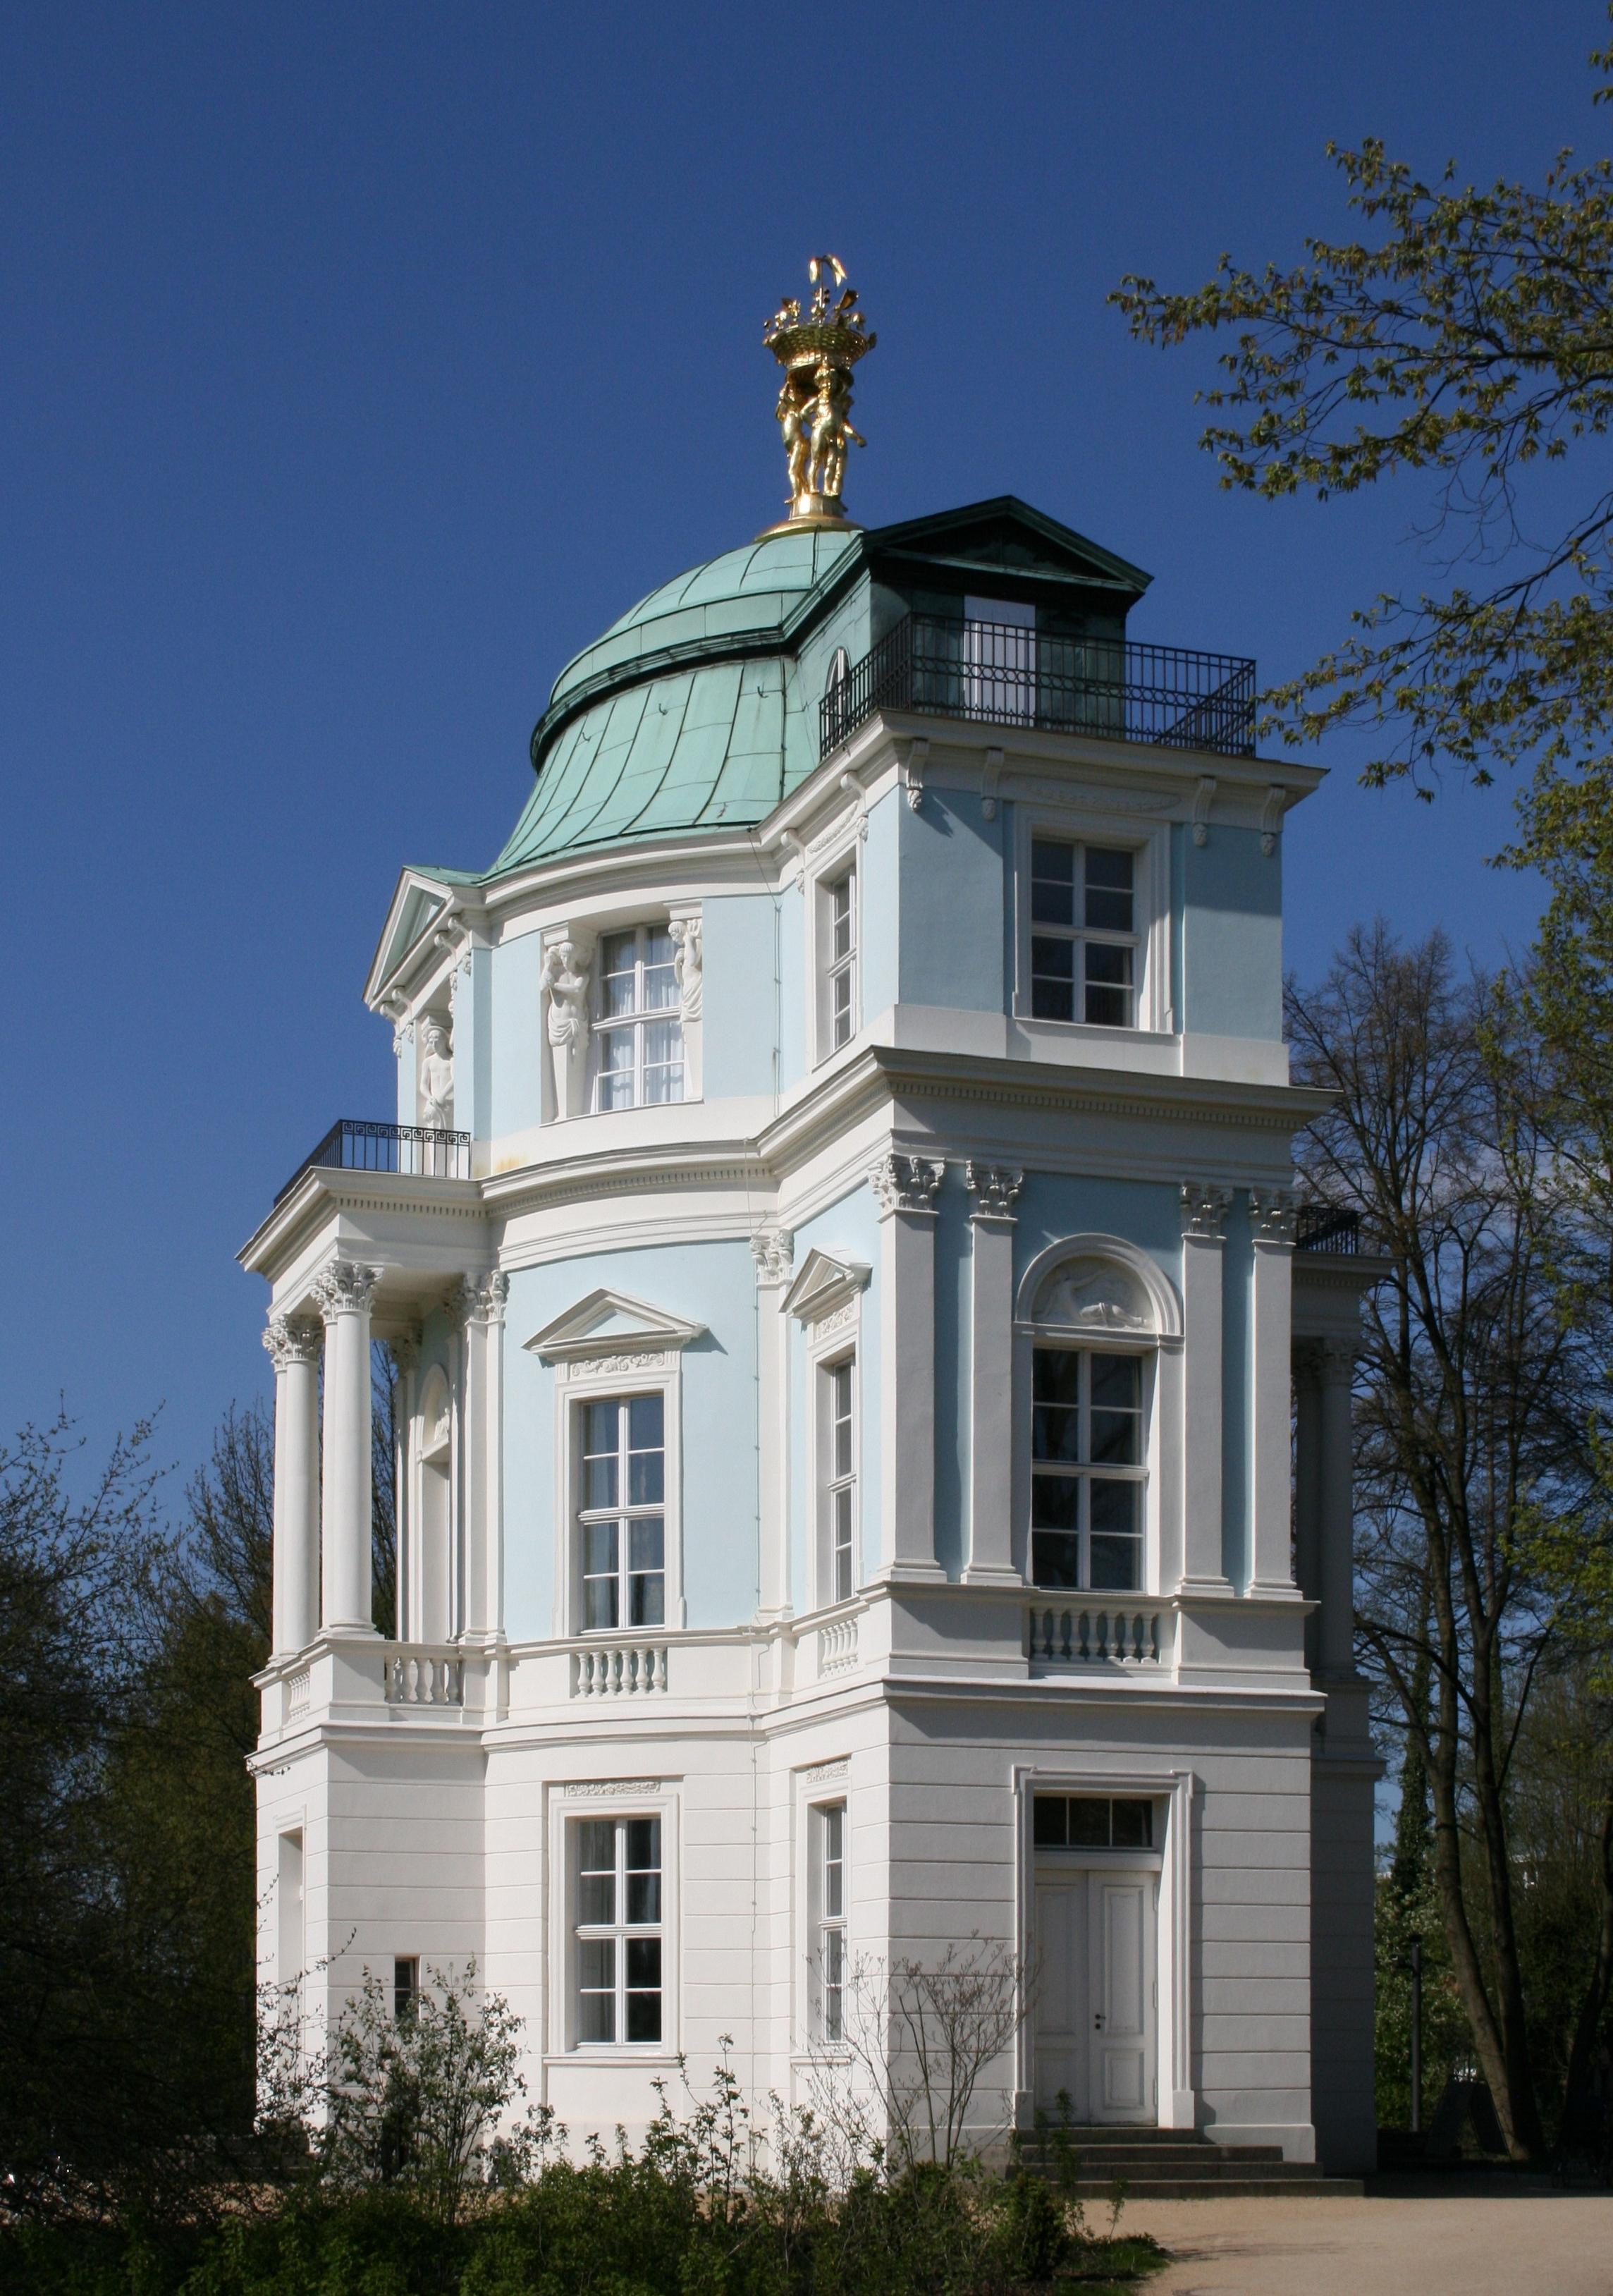 Berlin belvedere schlossgarten charlottenburg 01 20080423.JPG